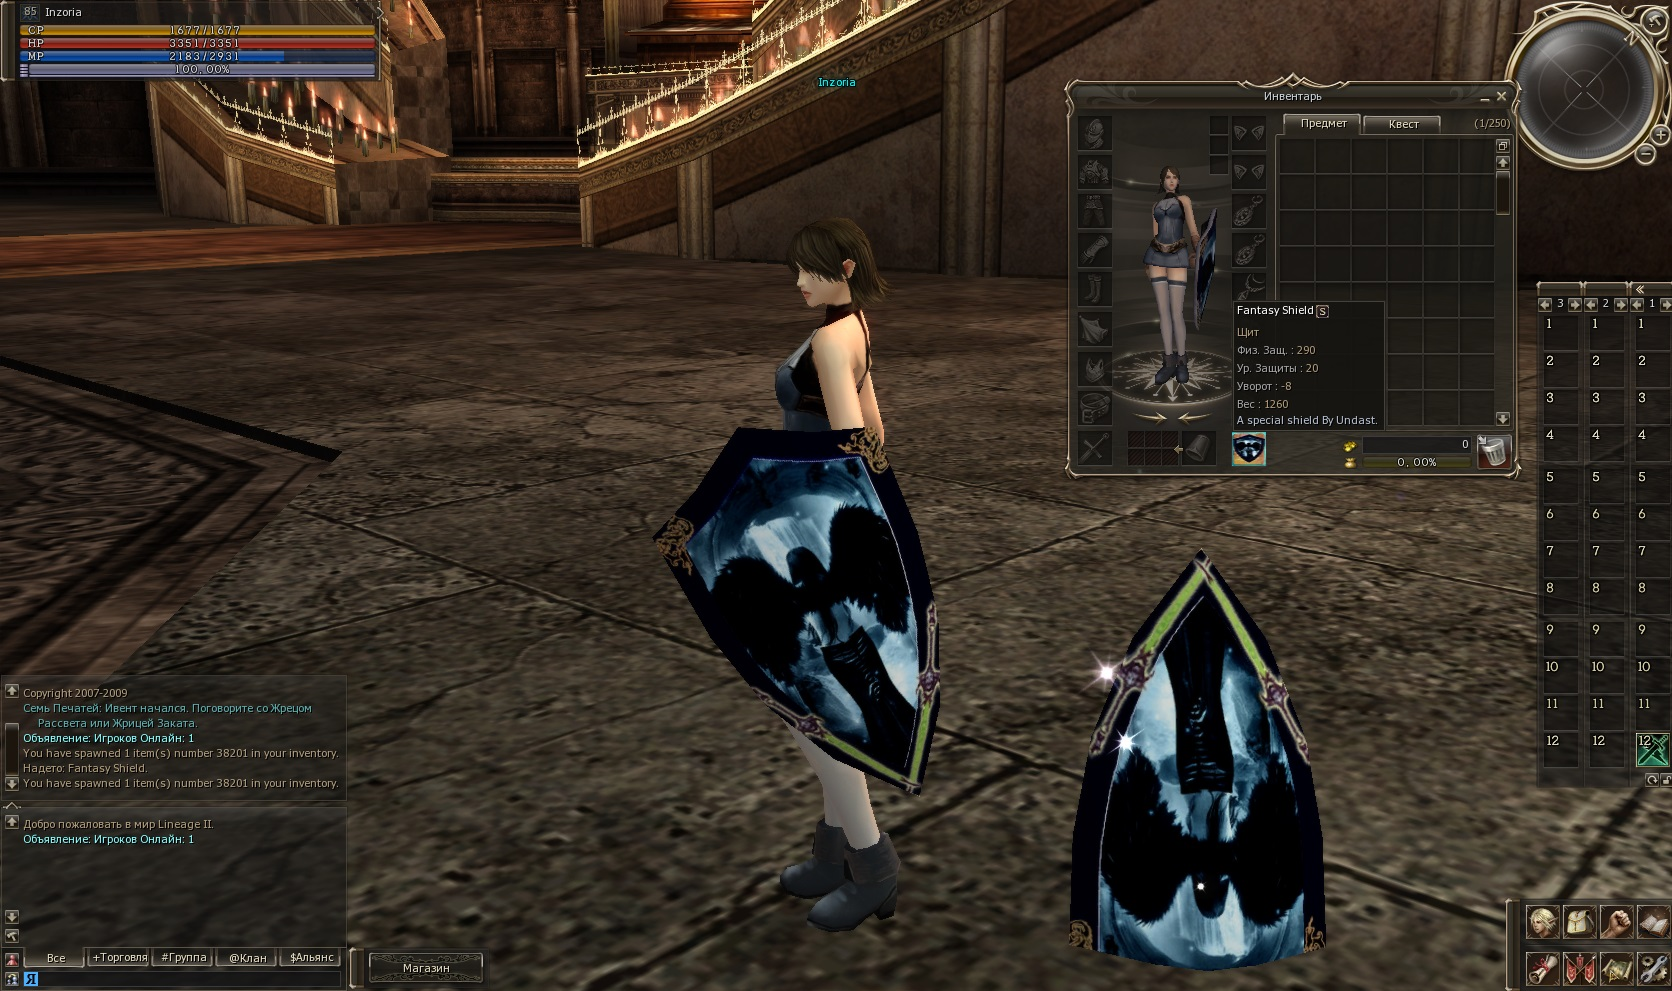 Weackpack - new npc, armor, weapon для la2offlineпарни помогите собрат